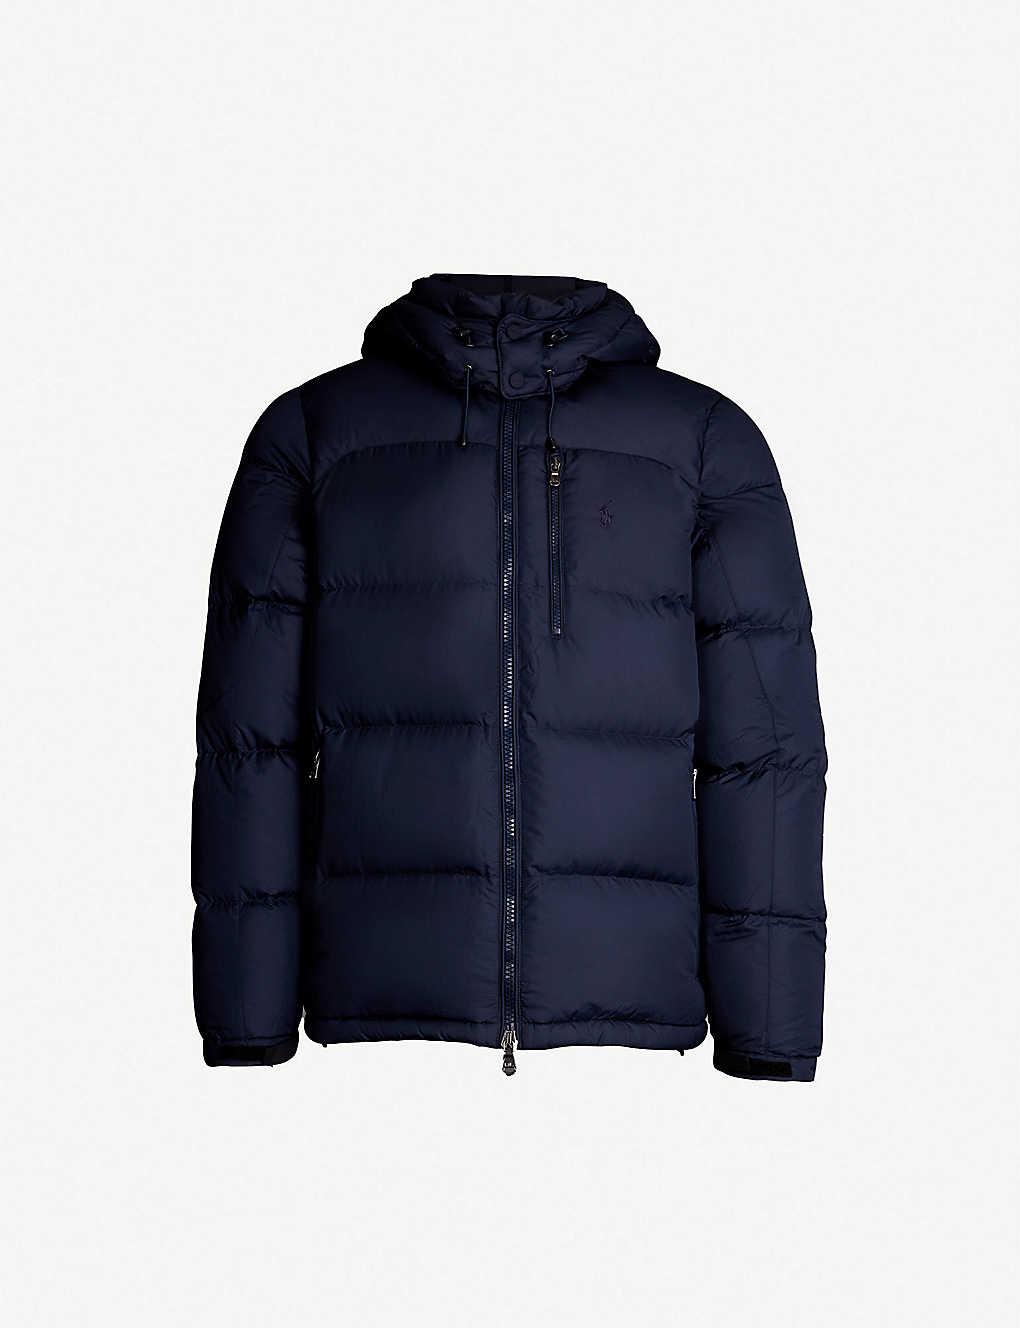 POLO RALPH LAUREN - Padded shell-down jacket   Selfridges.com 1e932b38aa91